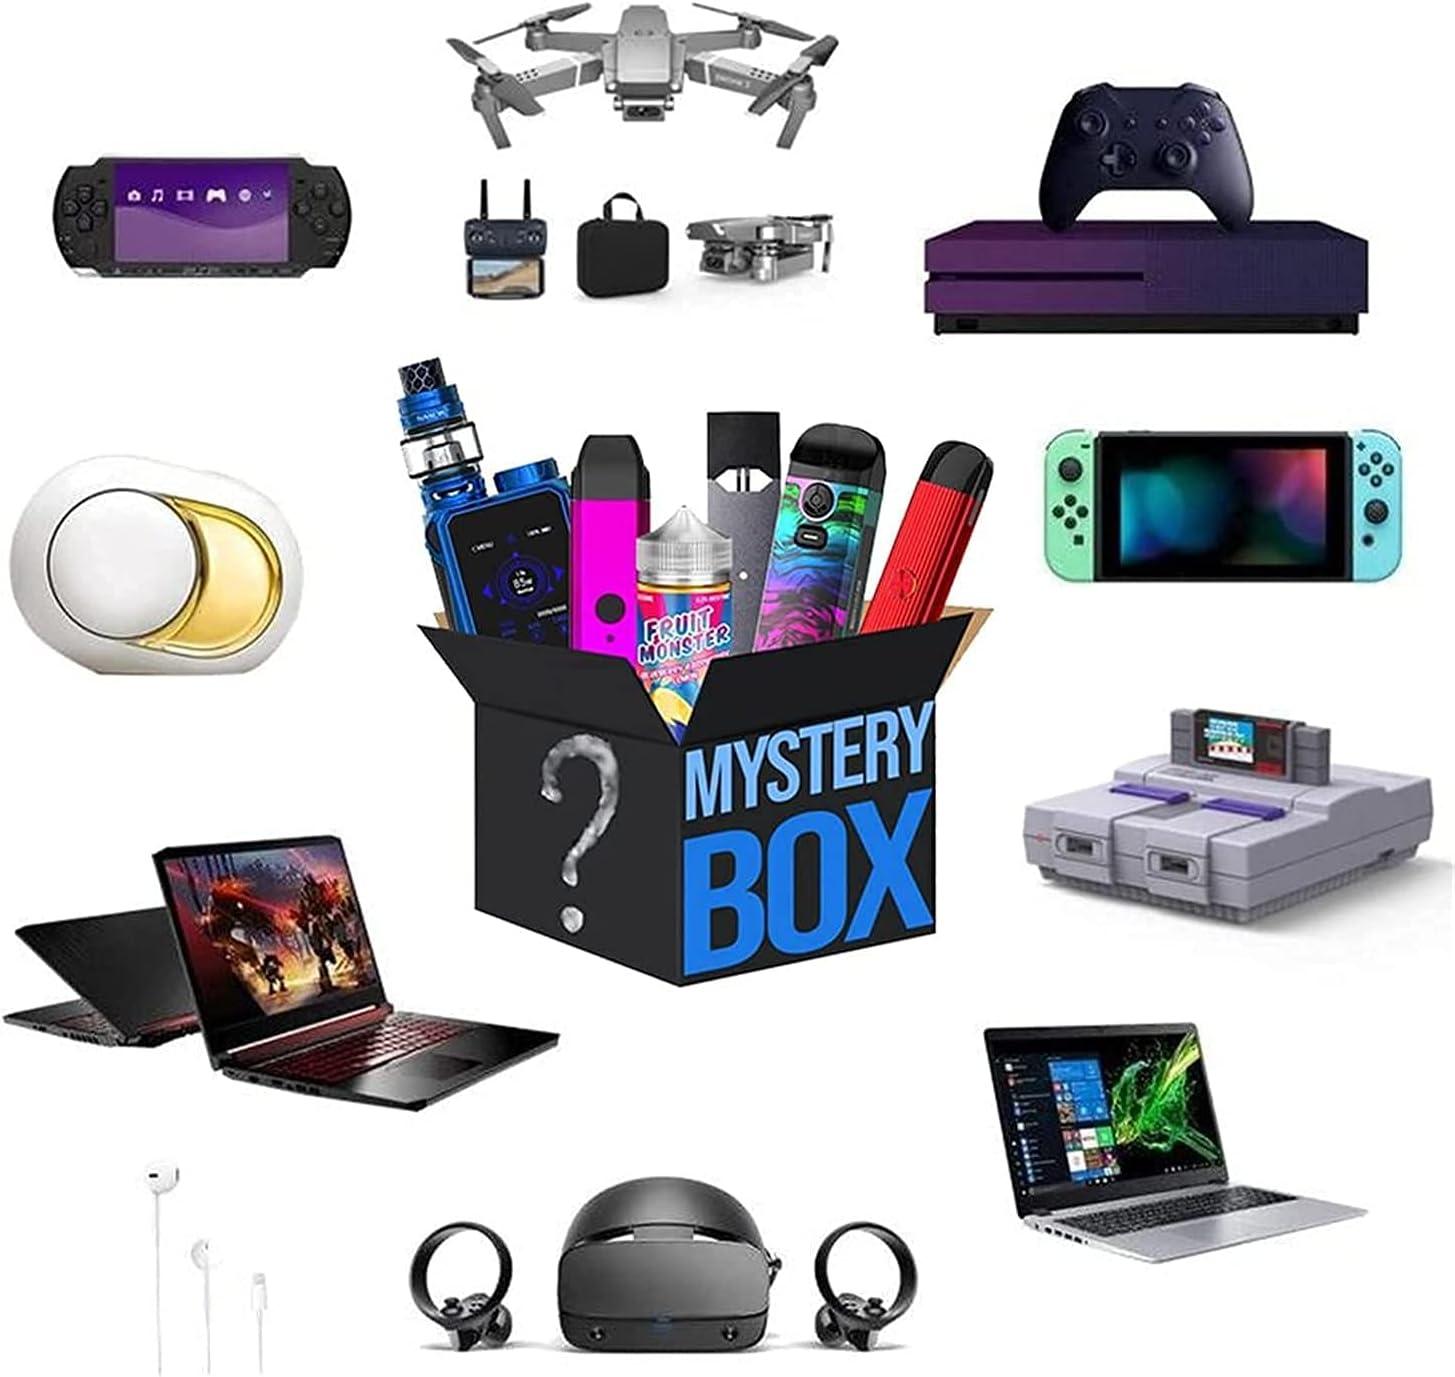 Mystery Box Electronics Boxes Surprise Birthday Random Sale Special Price Sacramento Mall